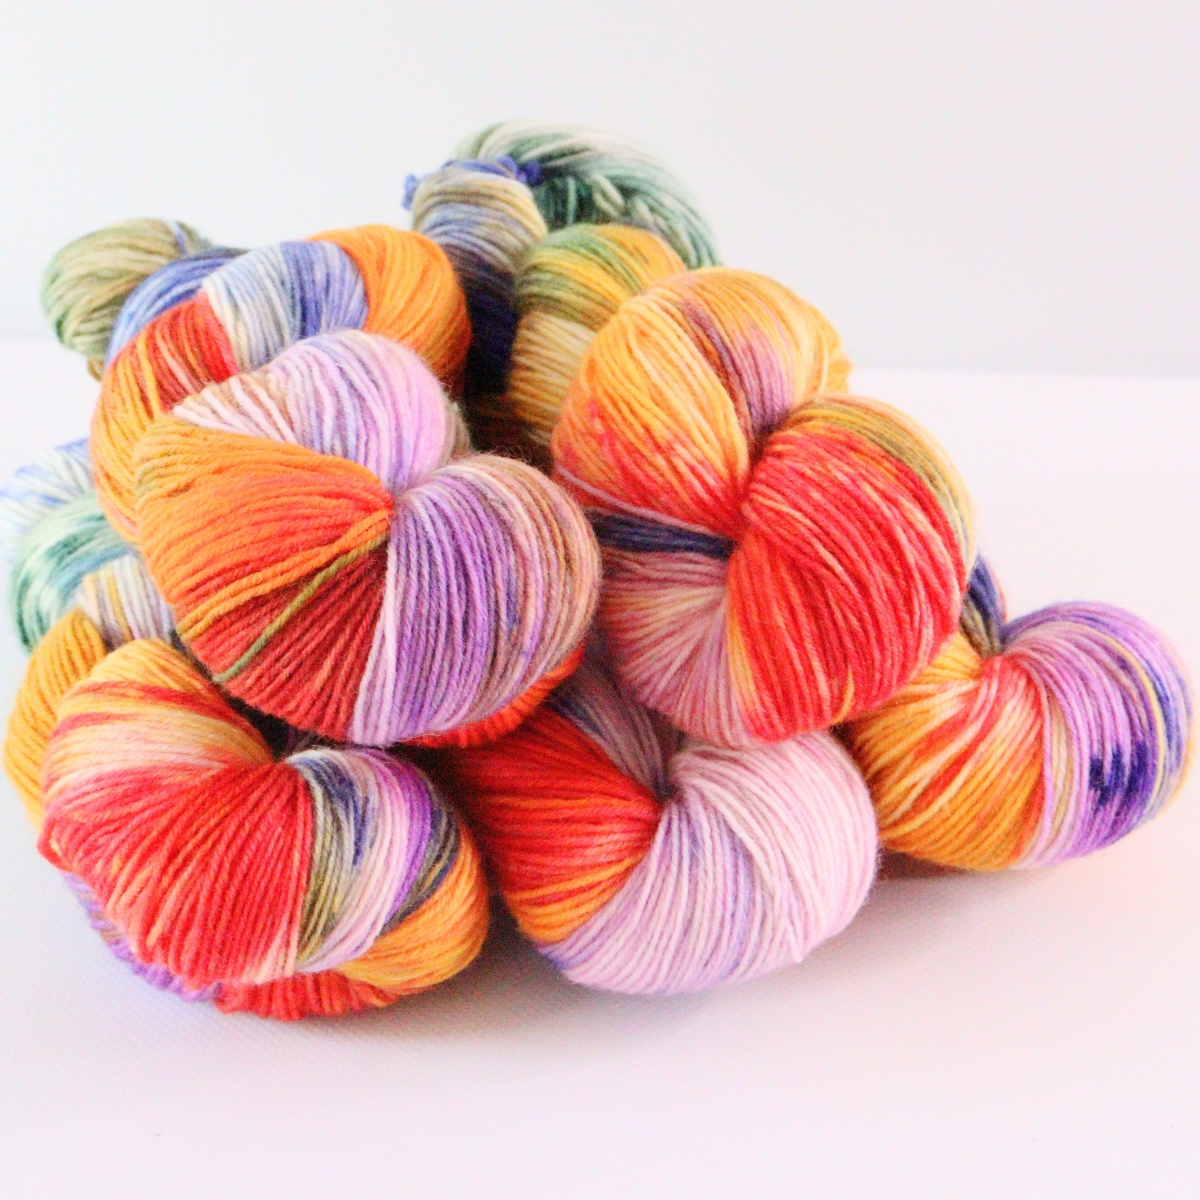 woodico.pro hand dyed yarn 078 1200x1200 - Hand dyed yarn / 078